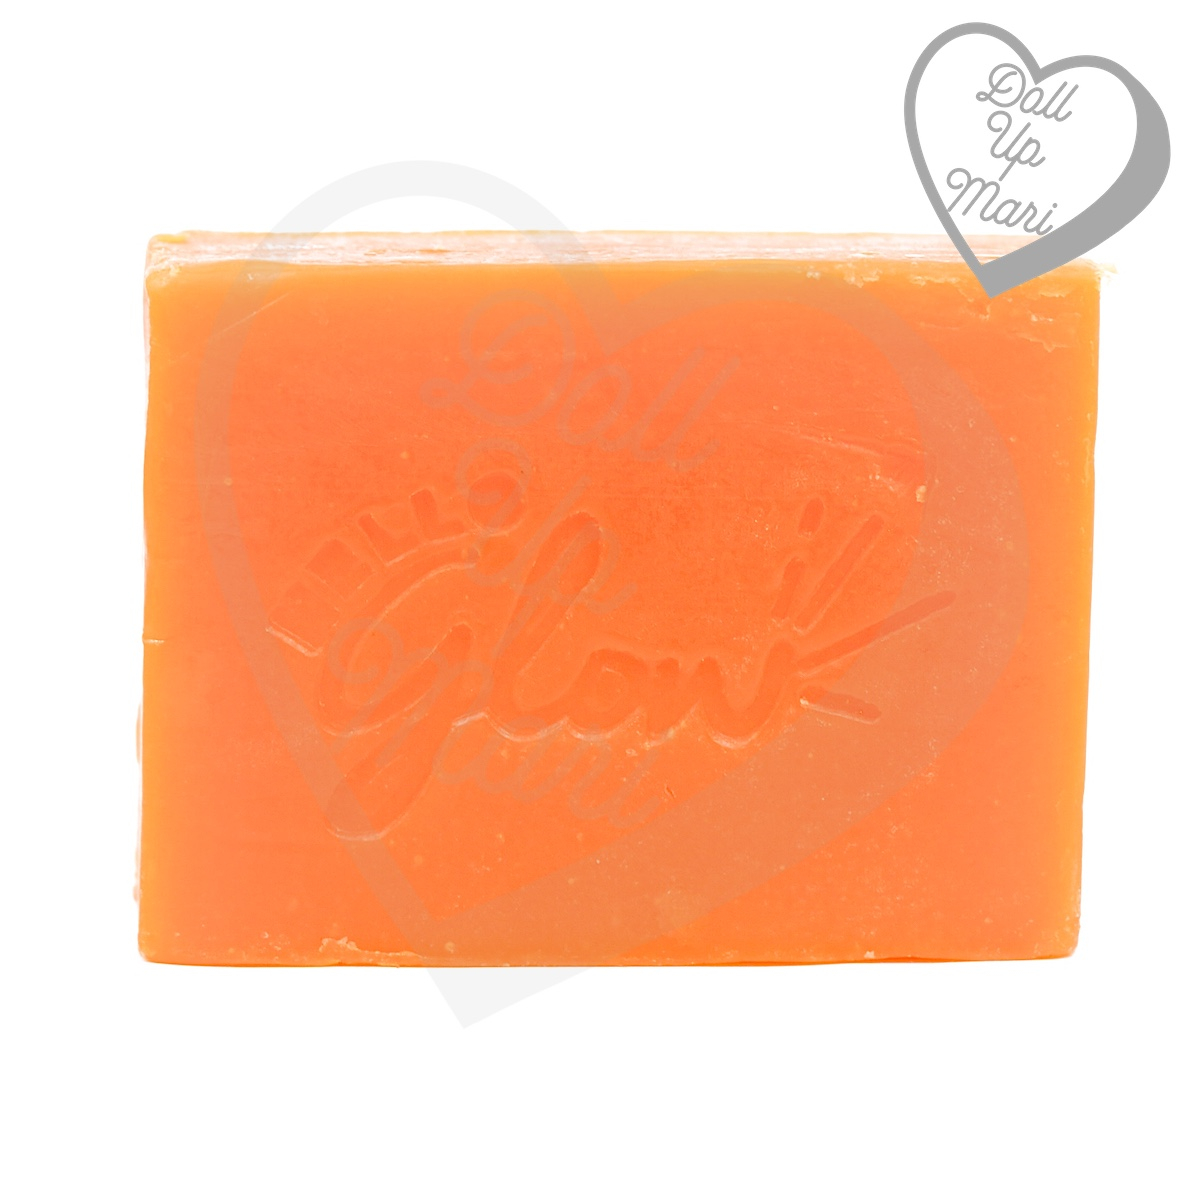 Hello Glow by Ever Bilena 4-in-1 whitening soap bar